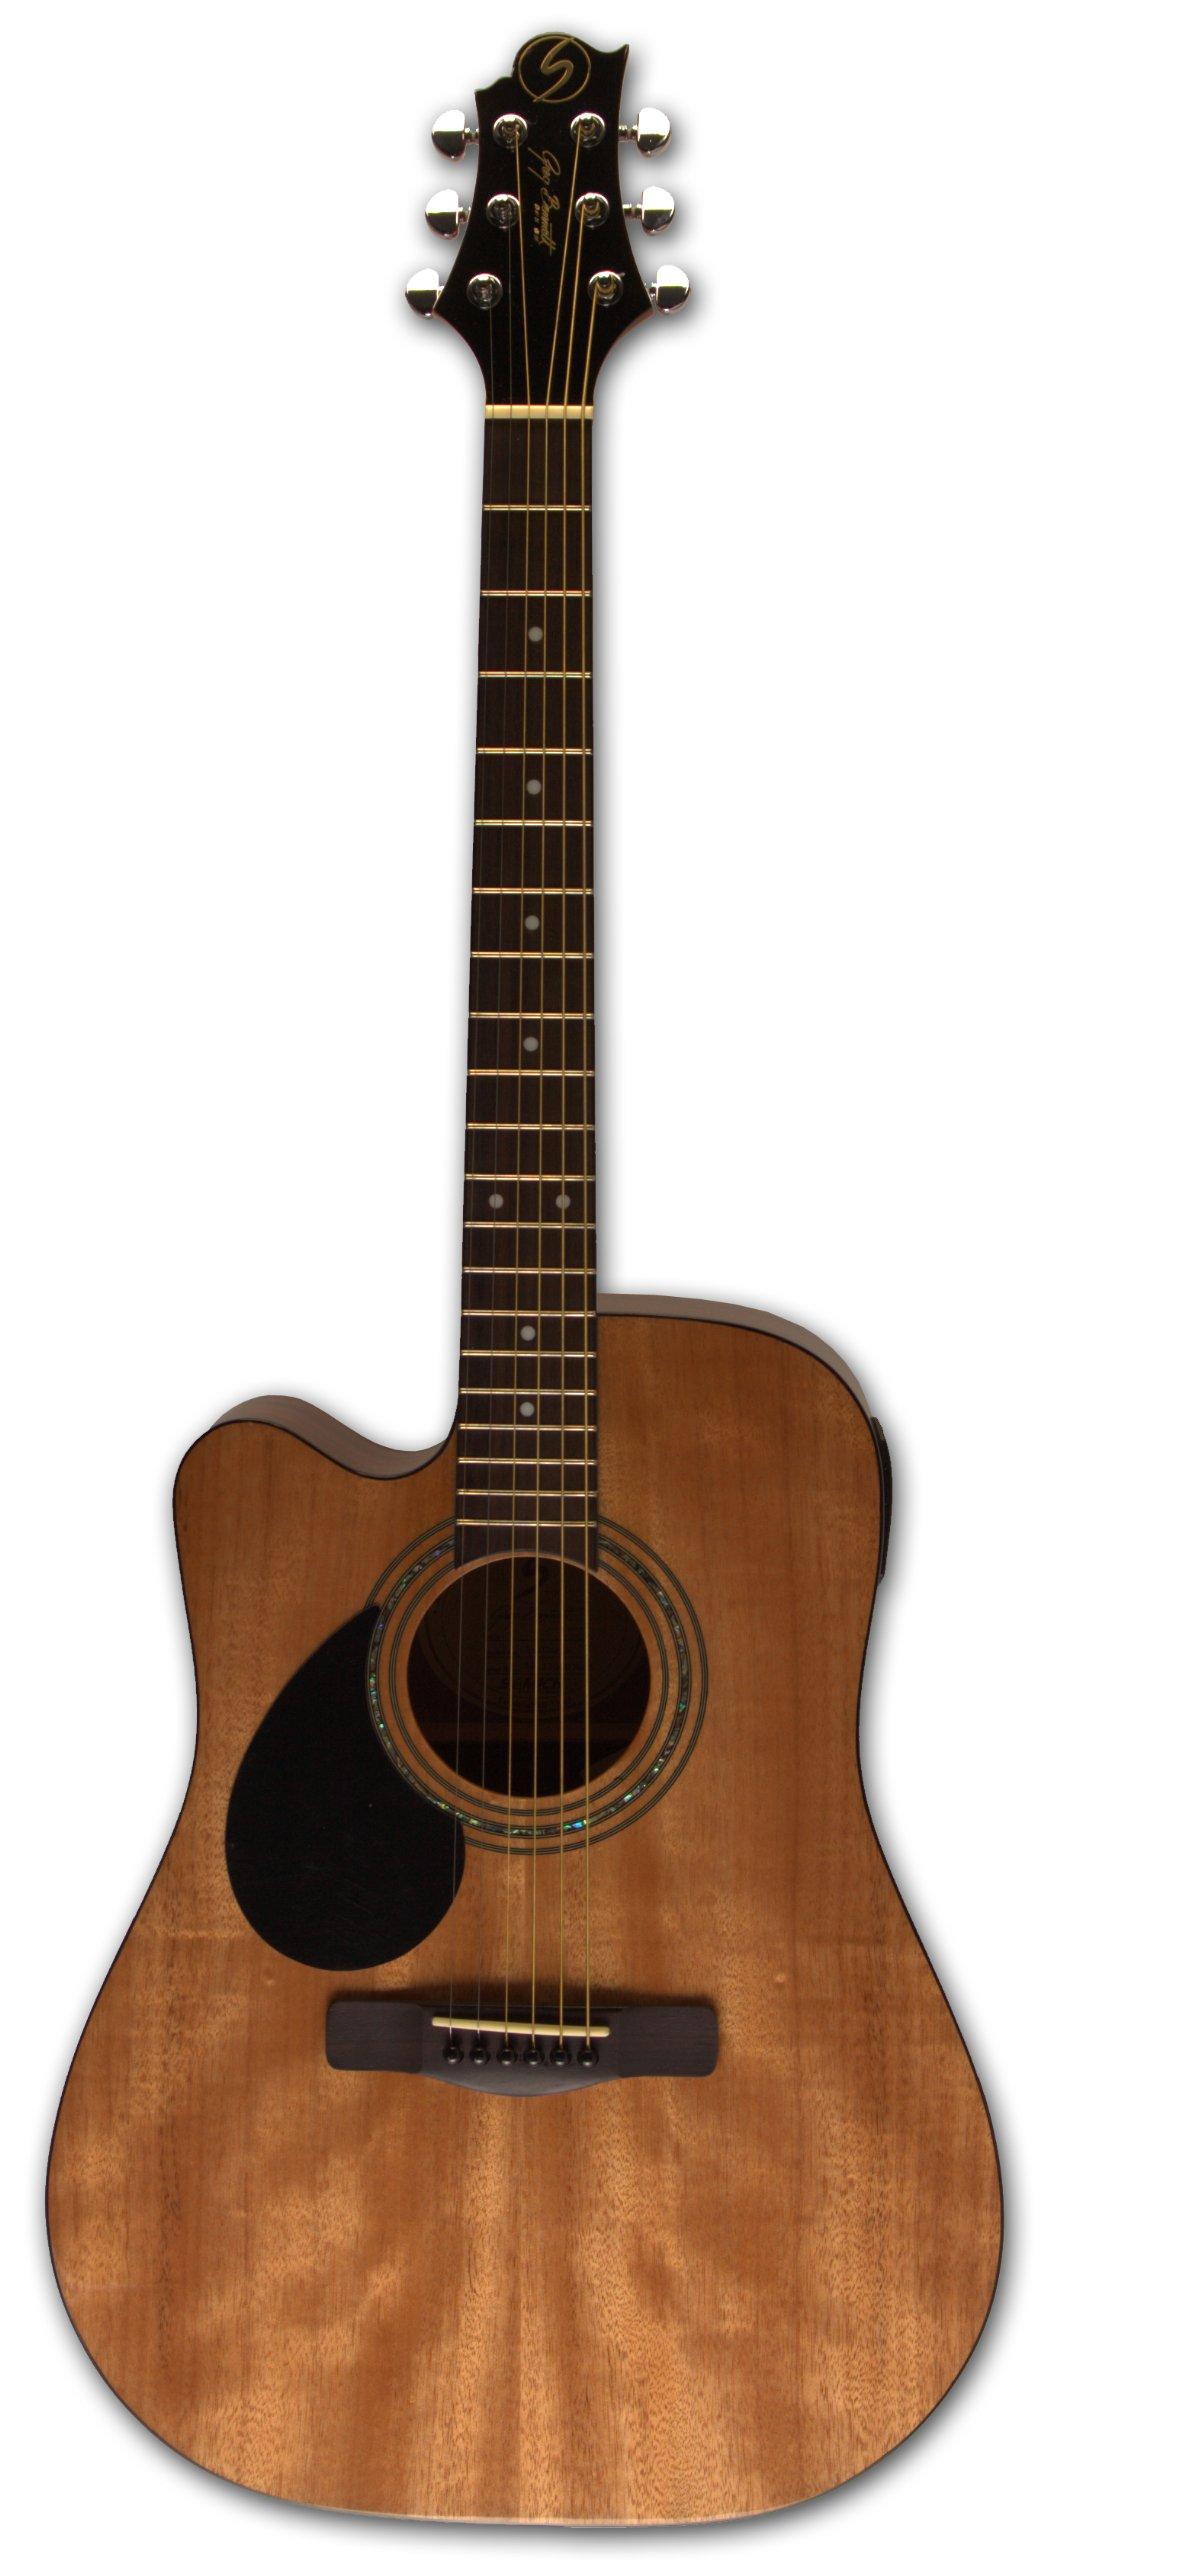 Samick Greg Bennett Design D1CE LH Acoustic Guitar, Natural by Samick